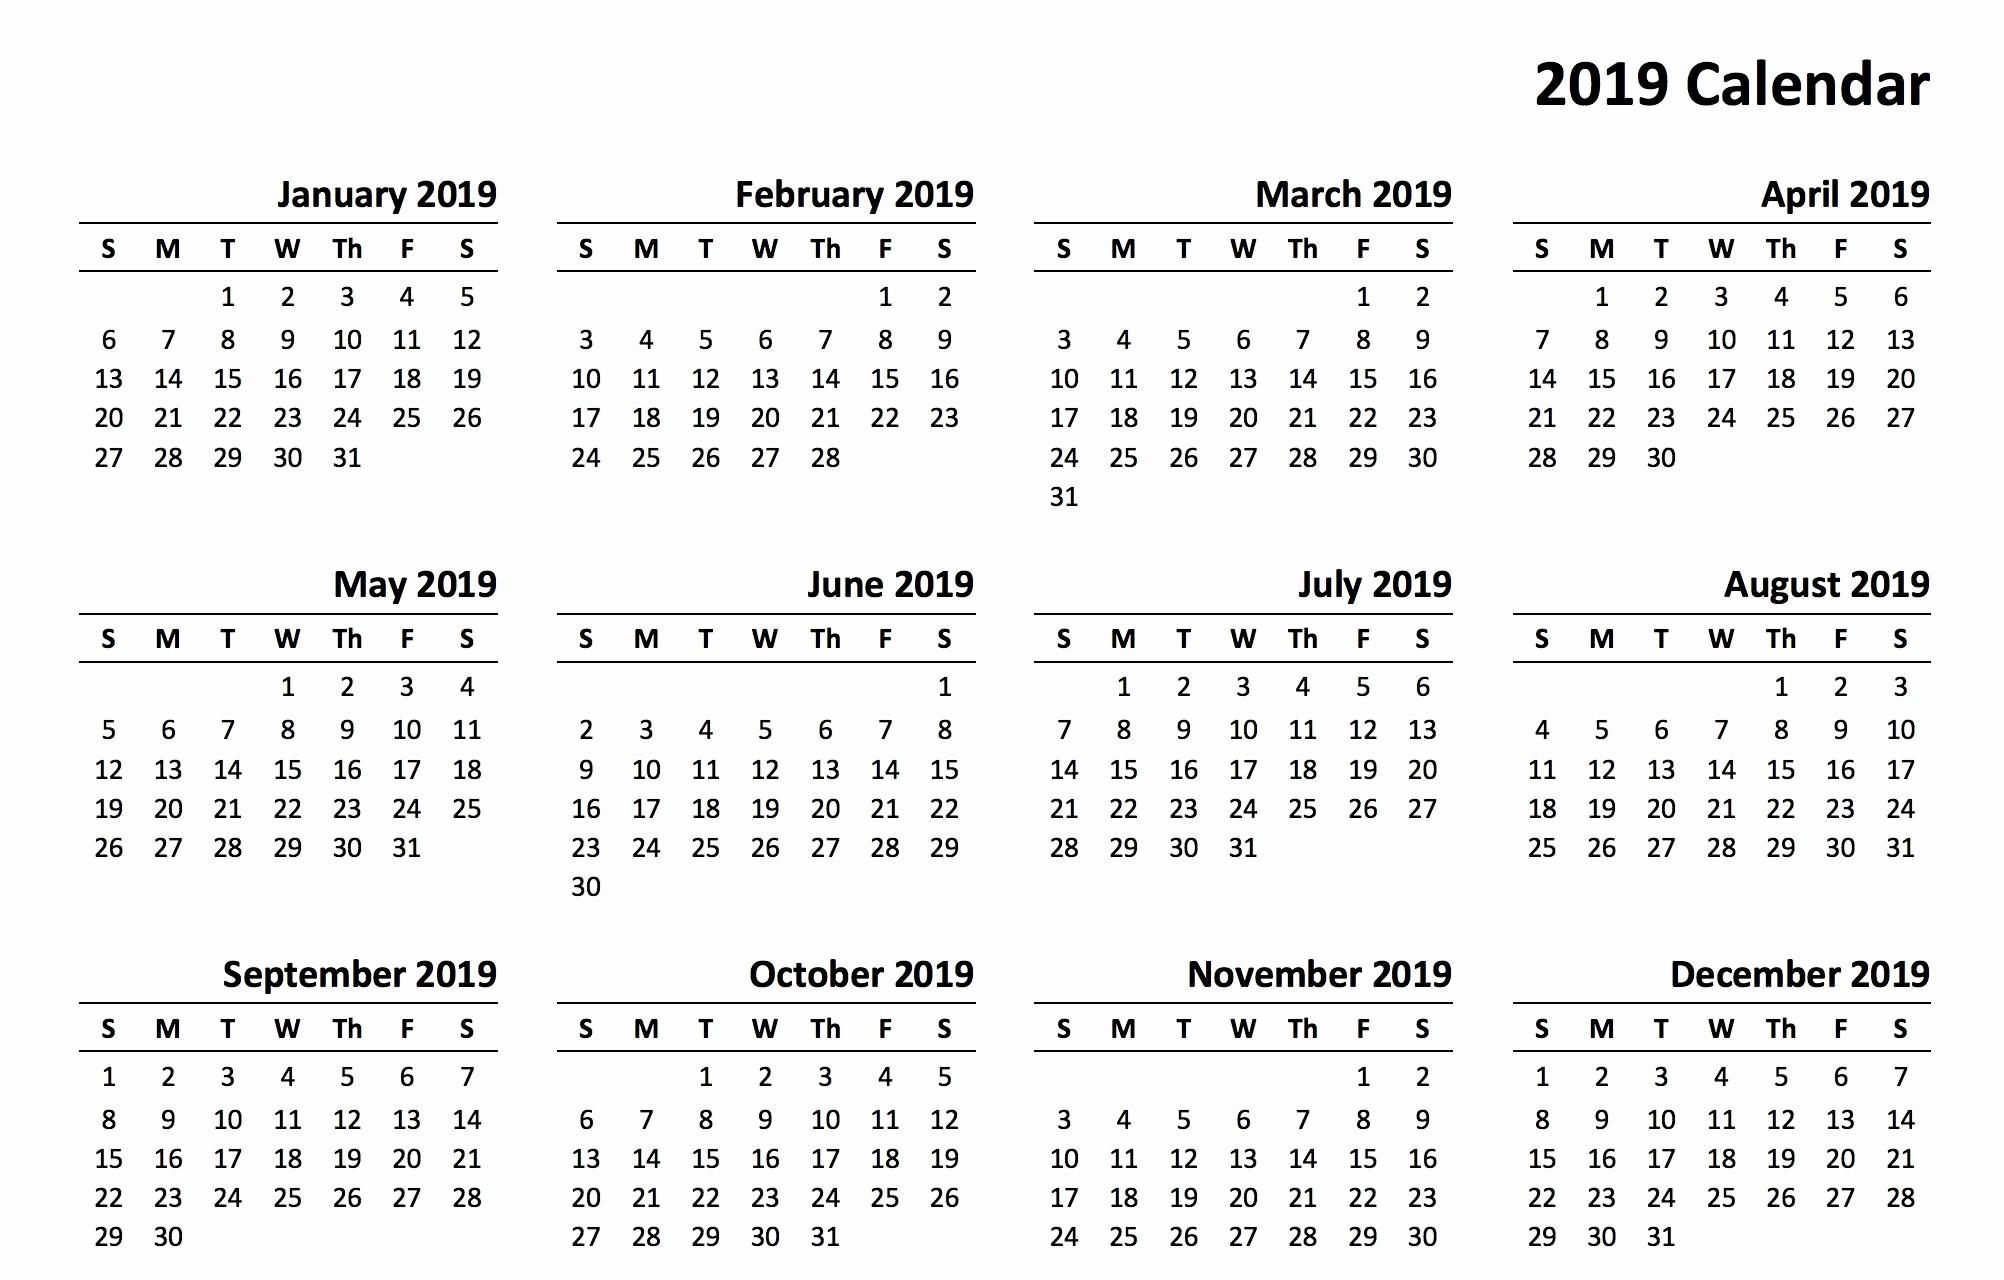 Free Printable Calendar Templates 2019 New Free Calendar Templates 2019 Printable